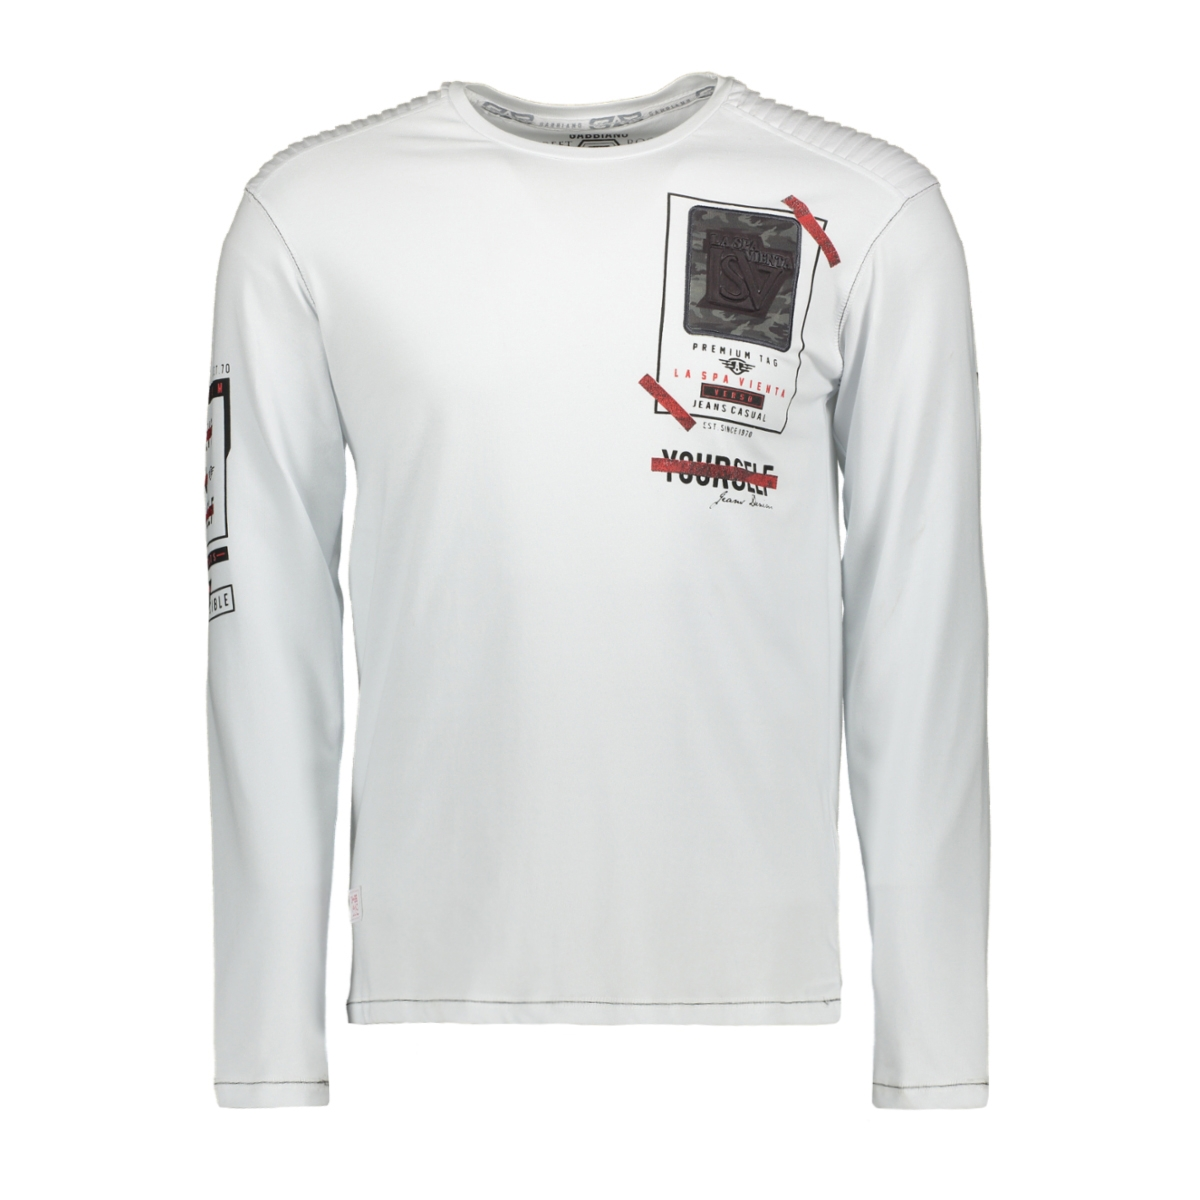 13857 gabbiano t-shirt white